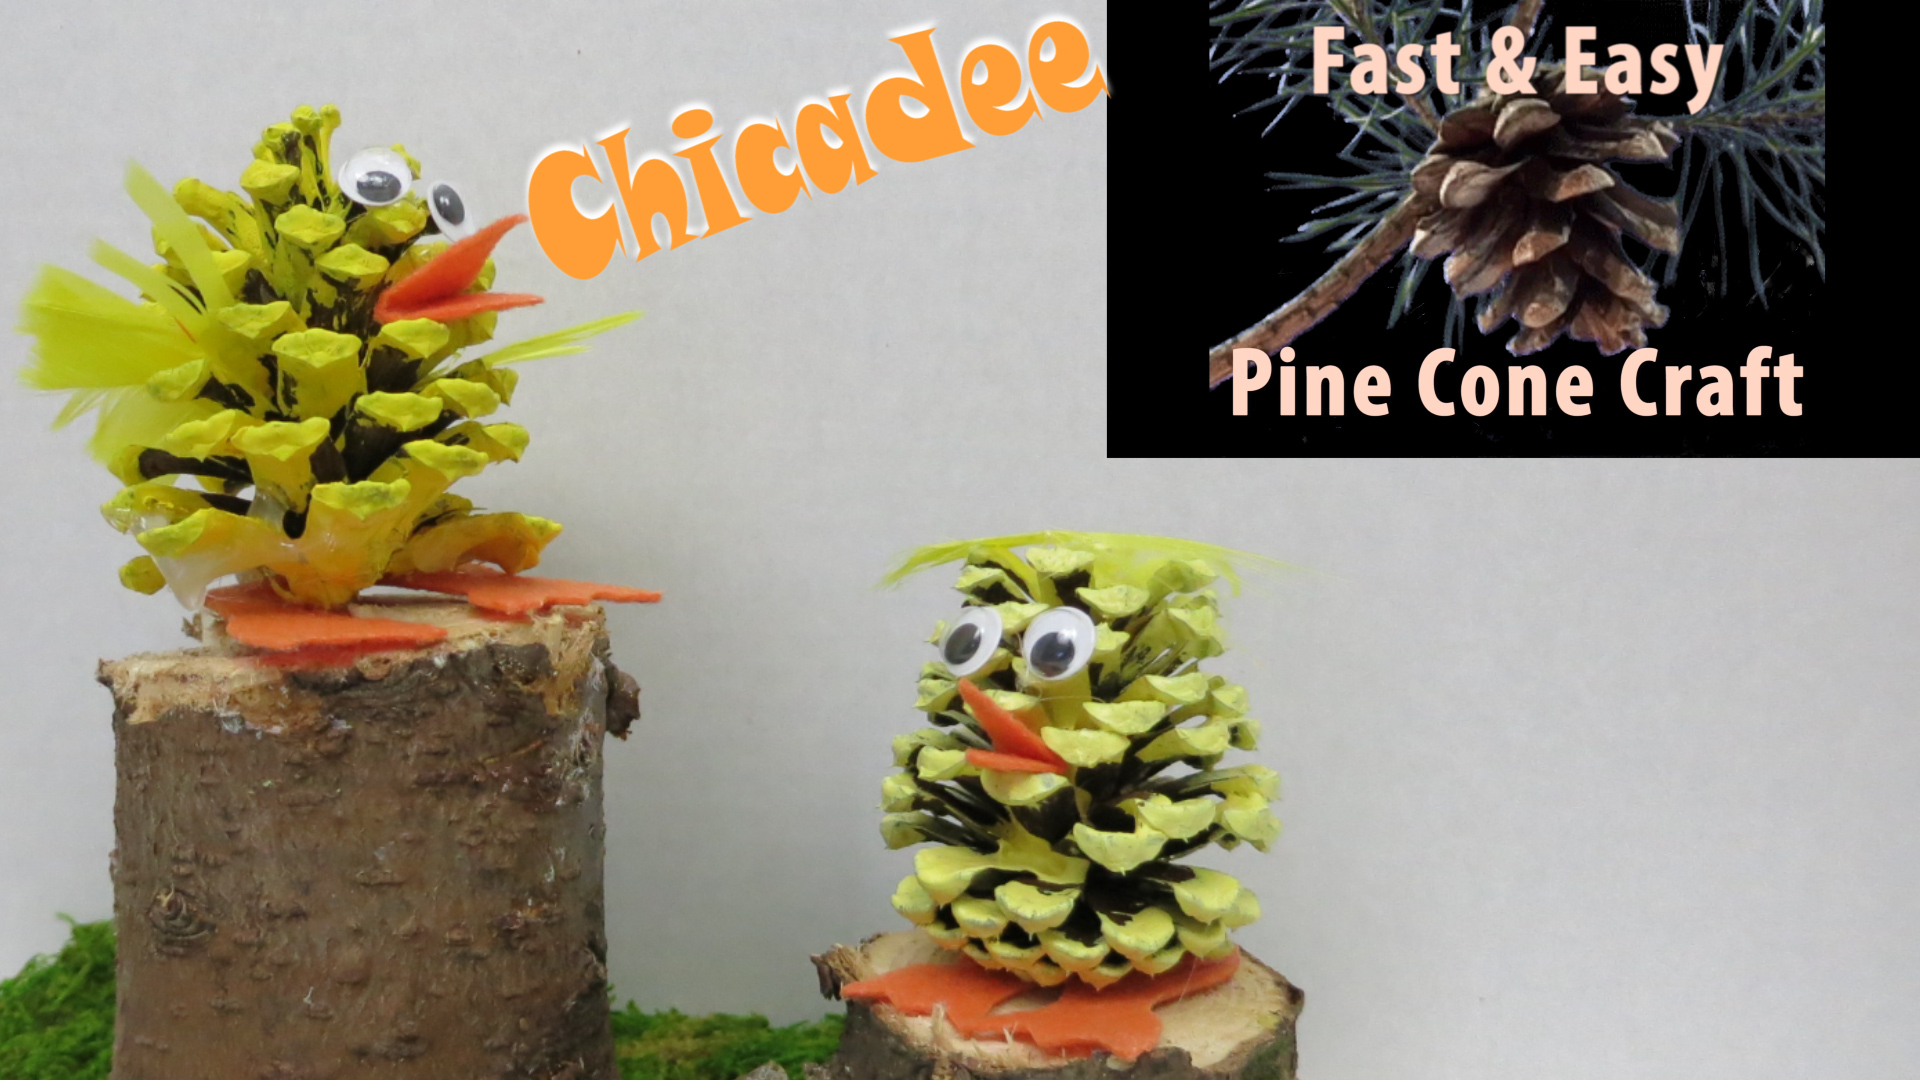 Fast and Easy Chickadee Easter Pine Cone Craft by Hey Maaa.jpg